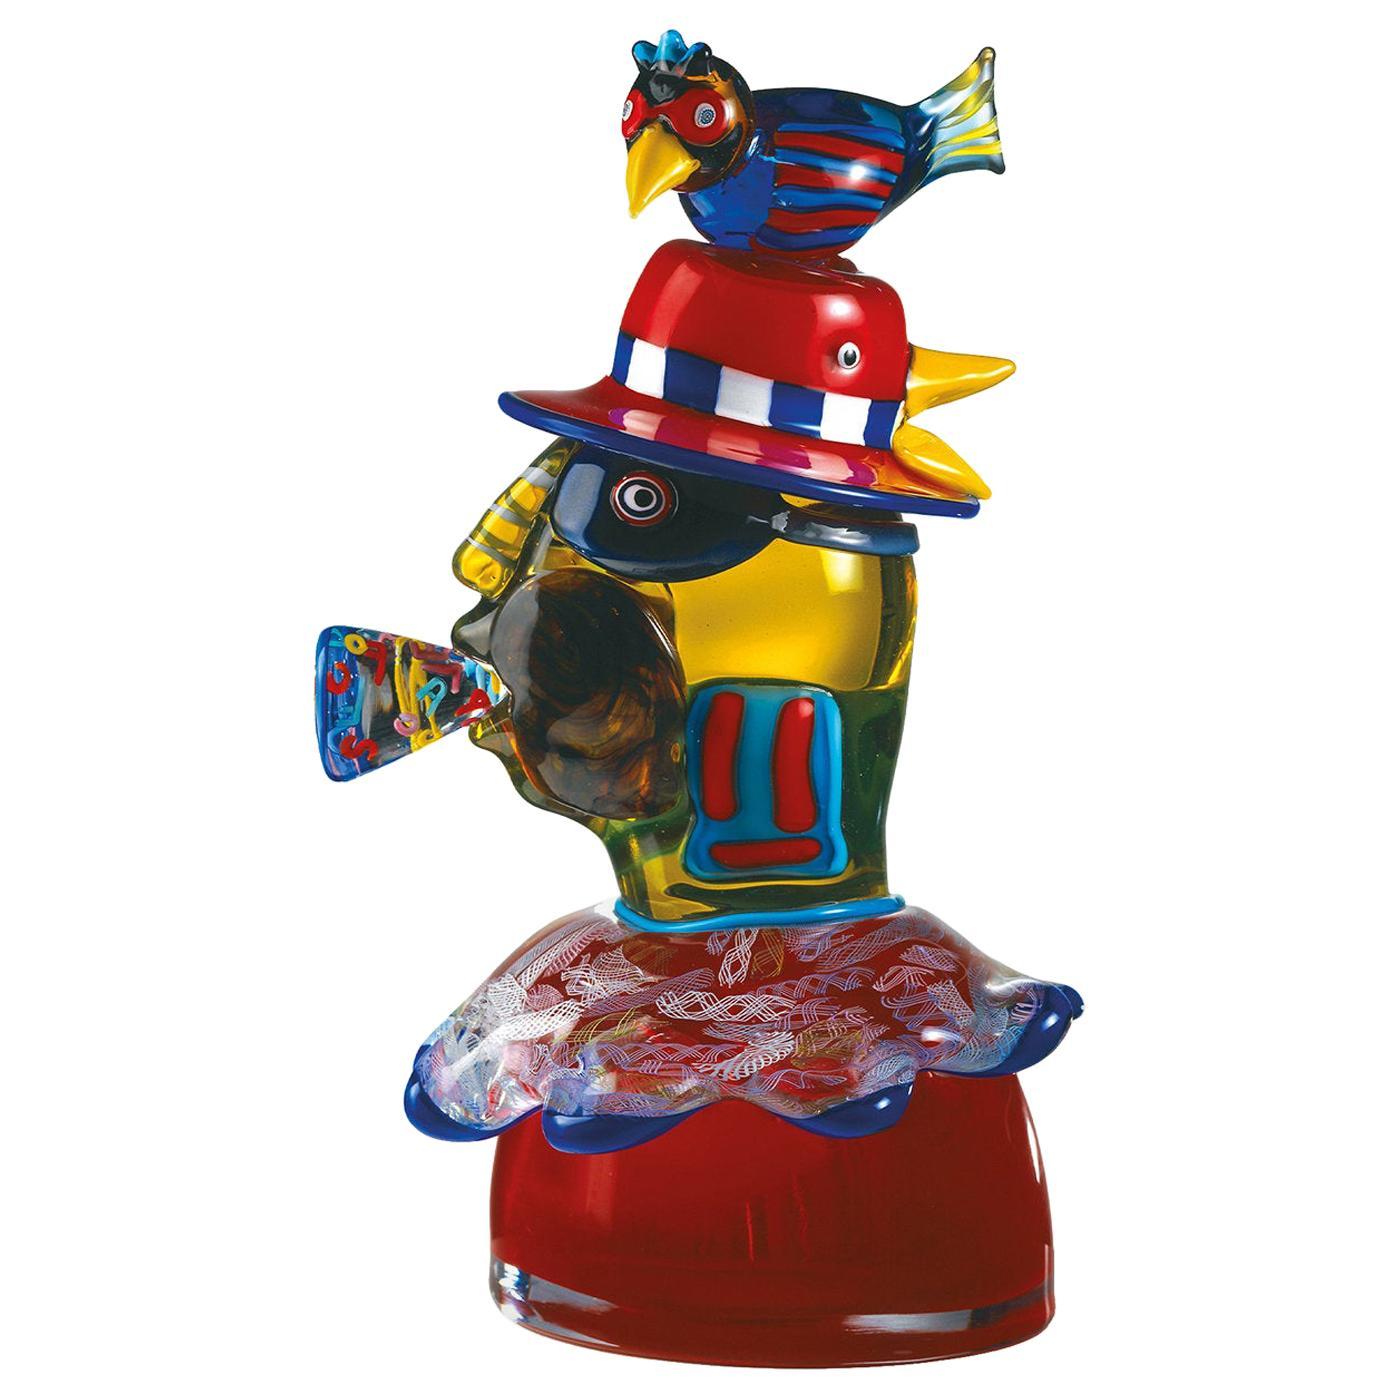 Pajaso Sculpture by Alfredo Sosabravo Limited Edition